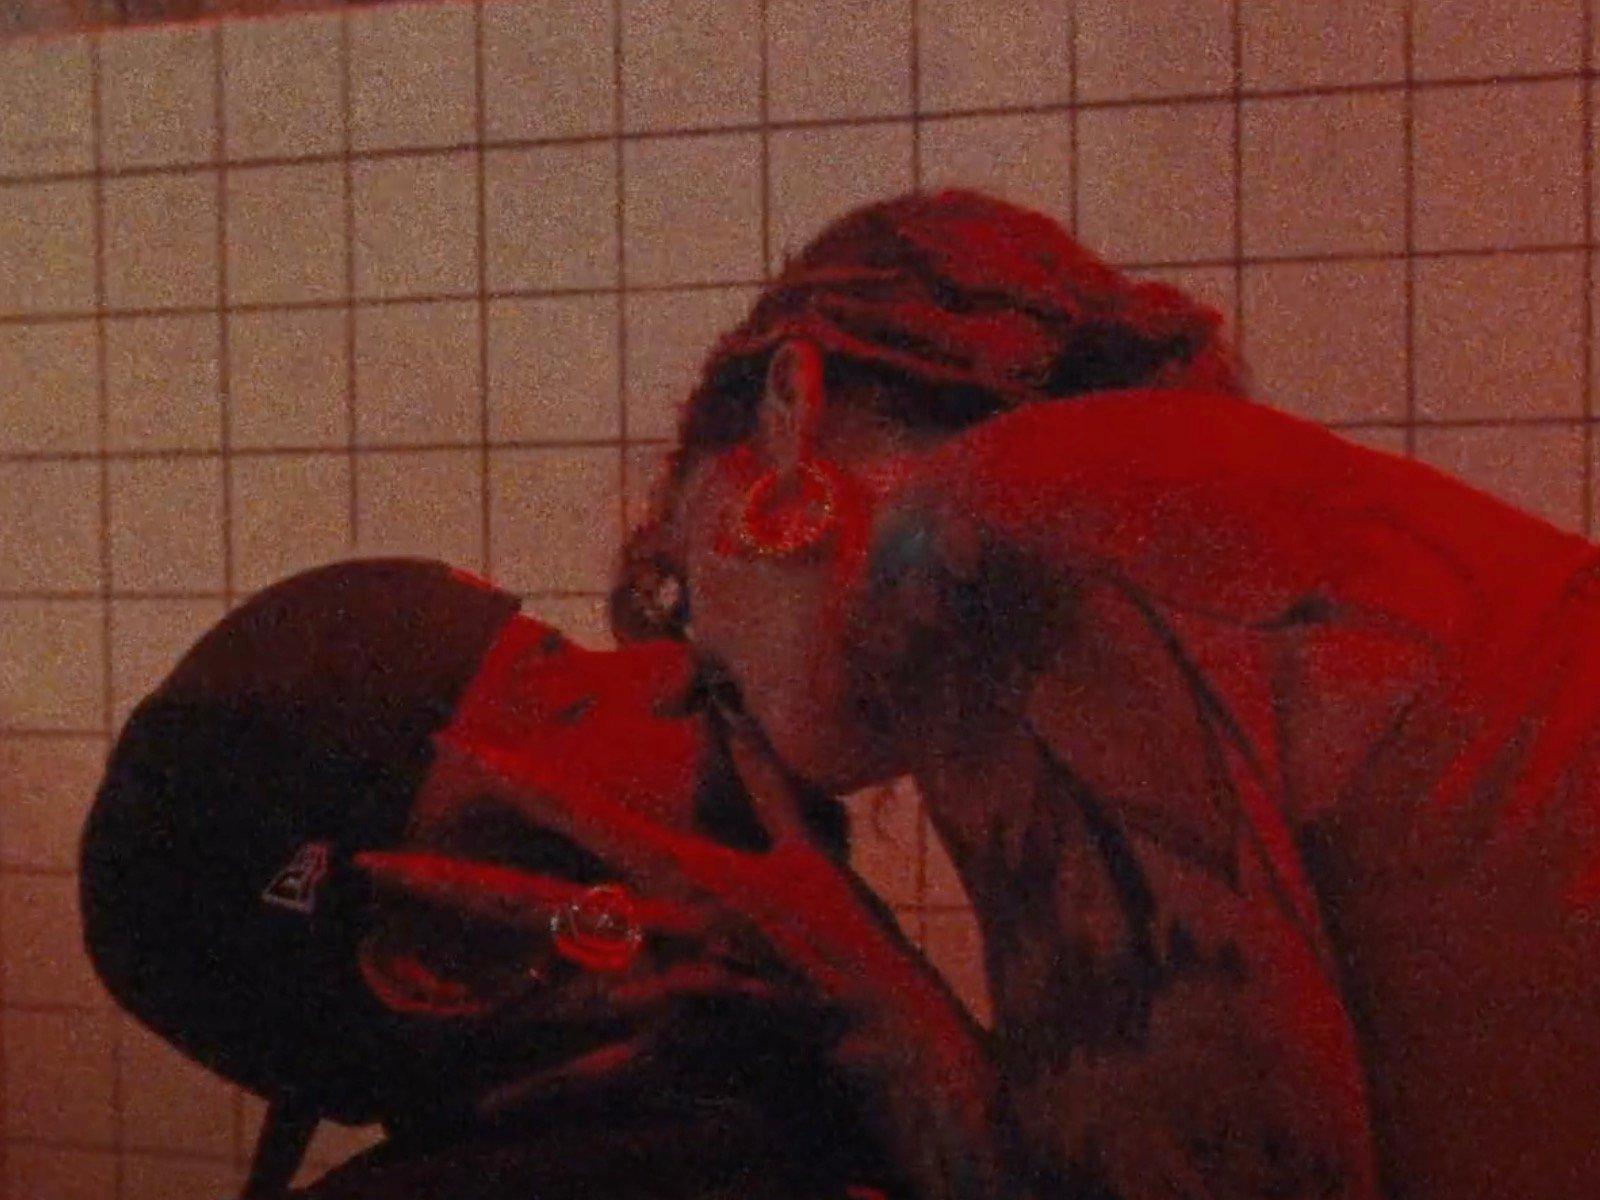 Bryson Tiller + Kehlani Get Hot In Always Forever Video 5